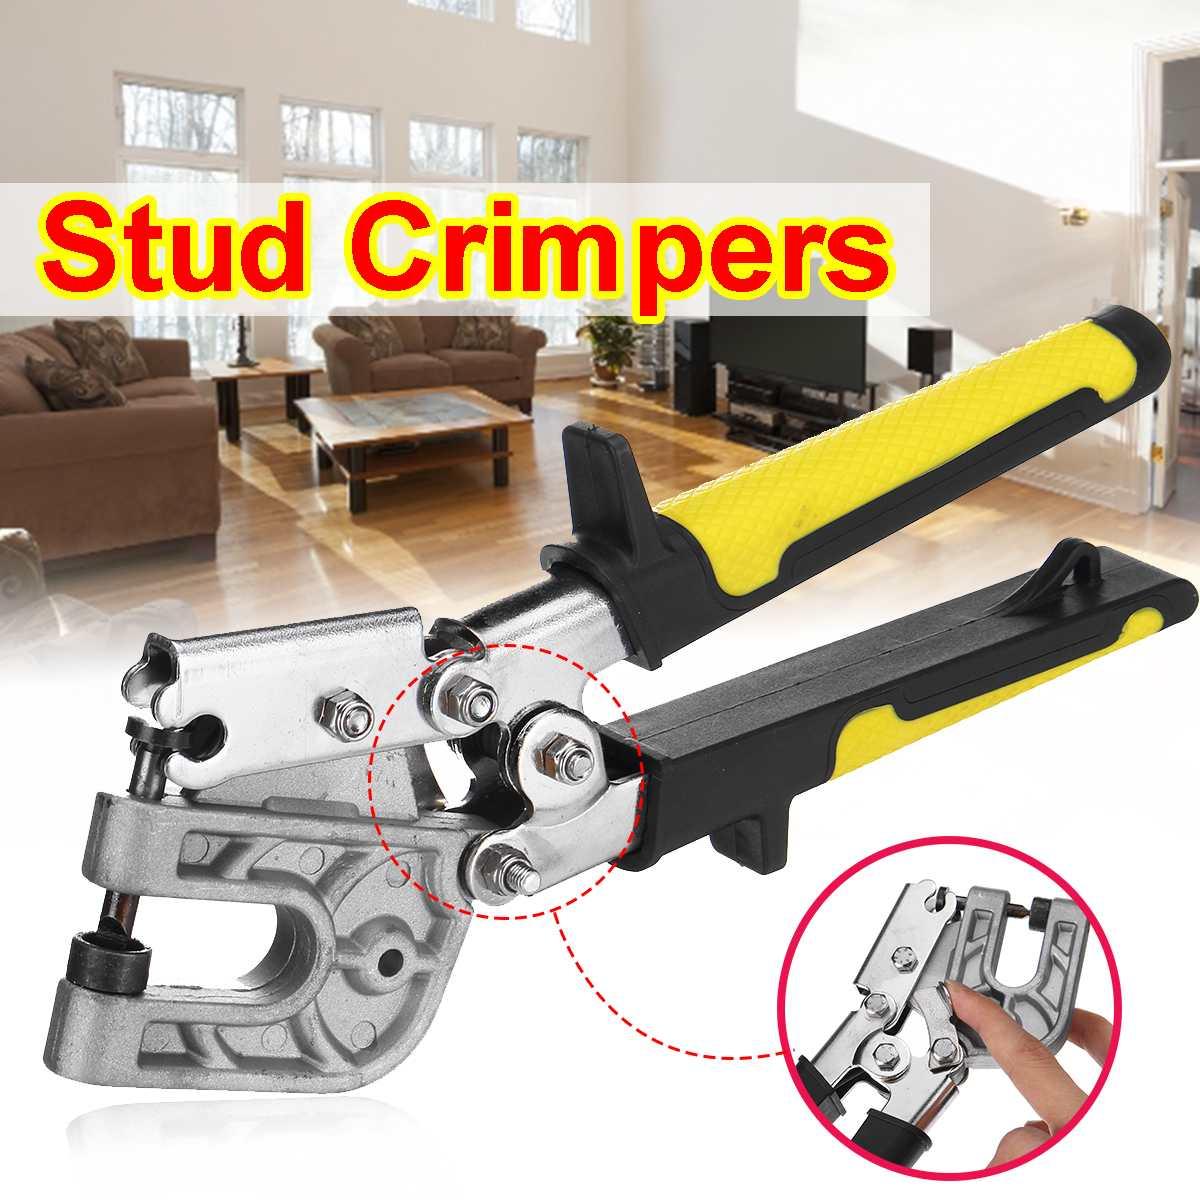 "doersupp 10"" High-carbon Steel Stud Crimper Punch Lock Single Hand Keel Fastening Forceps Professional Flat Mouth Metal Plier"